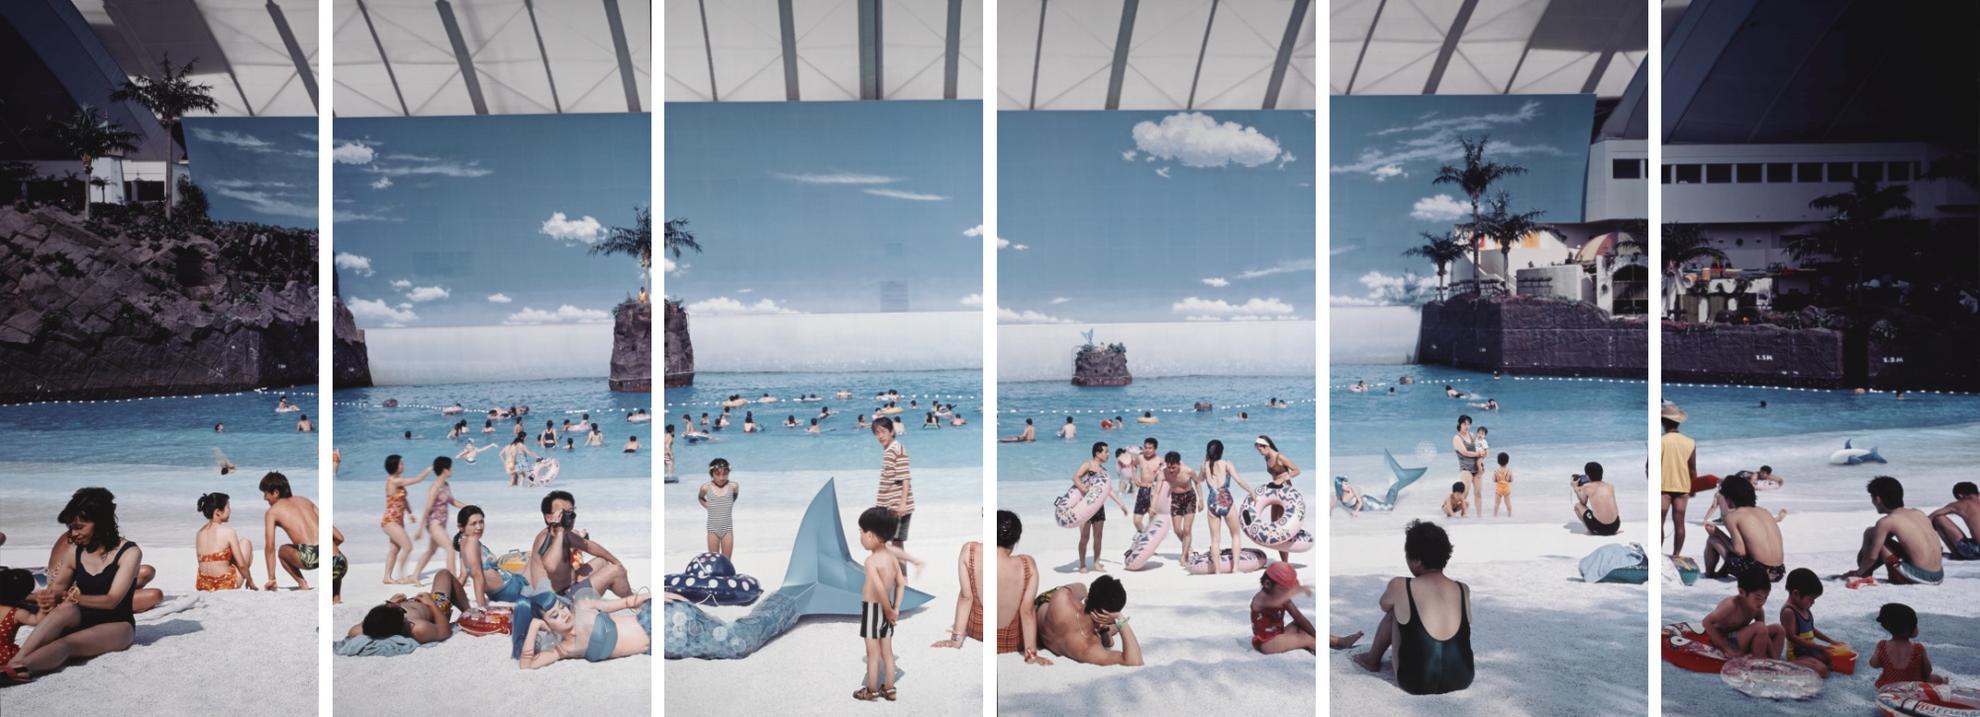 Mariko Mori-Empty Dream-1995